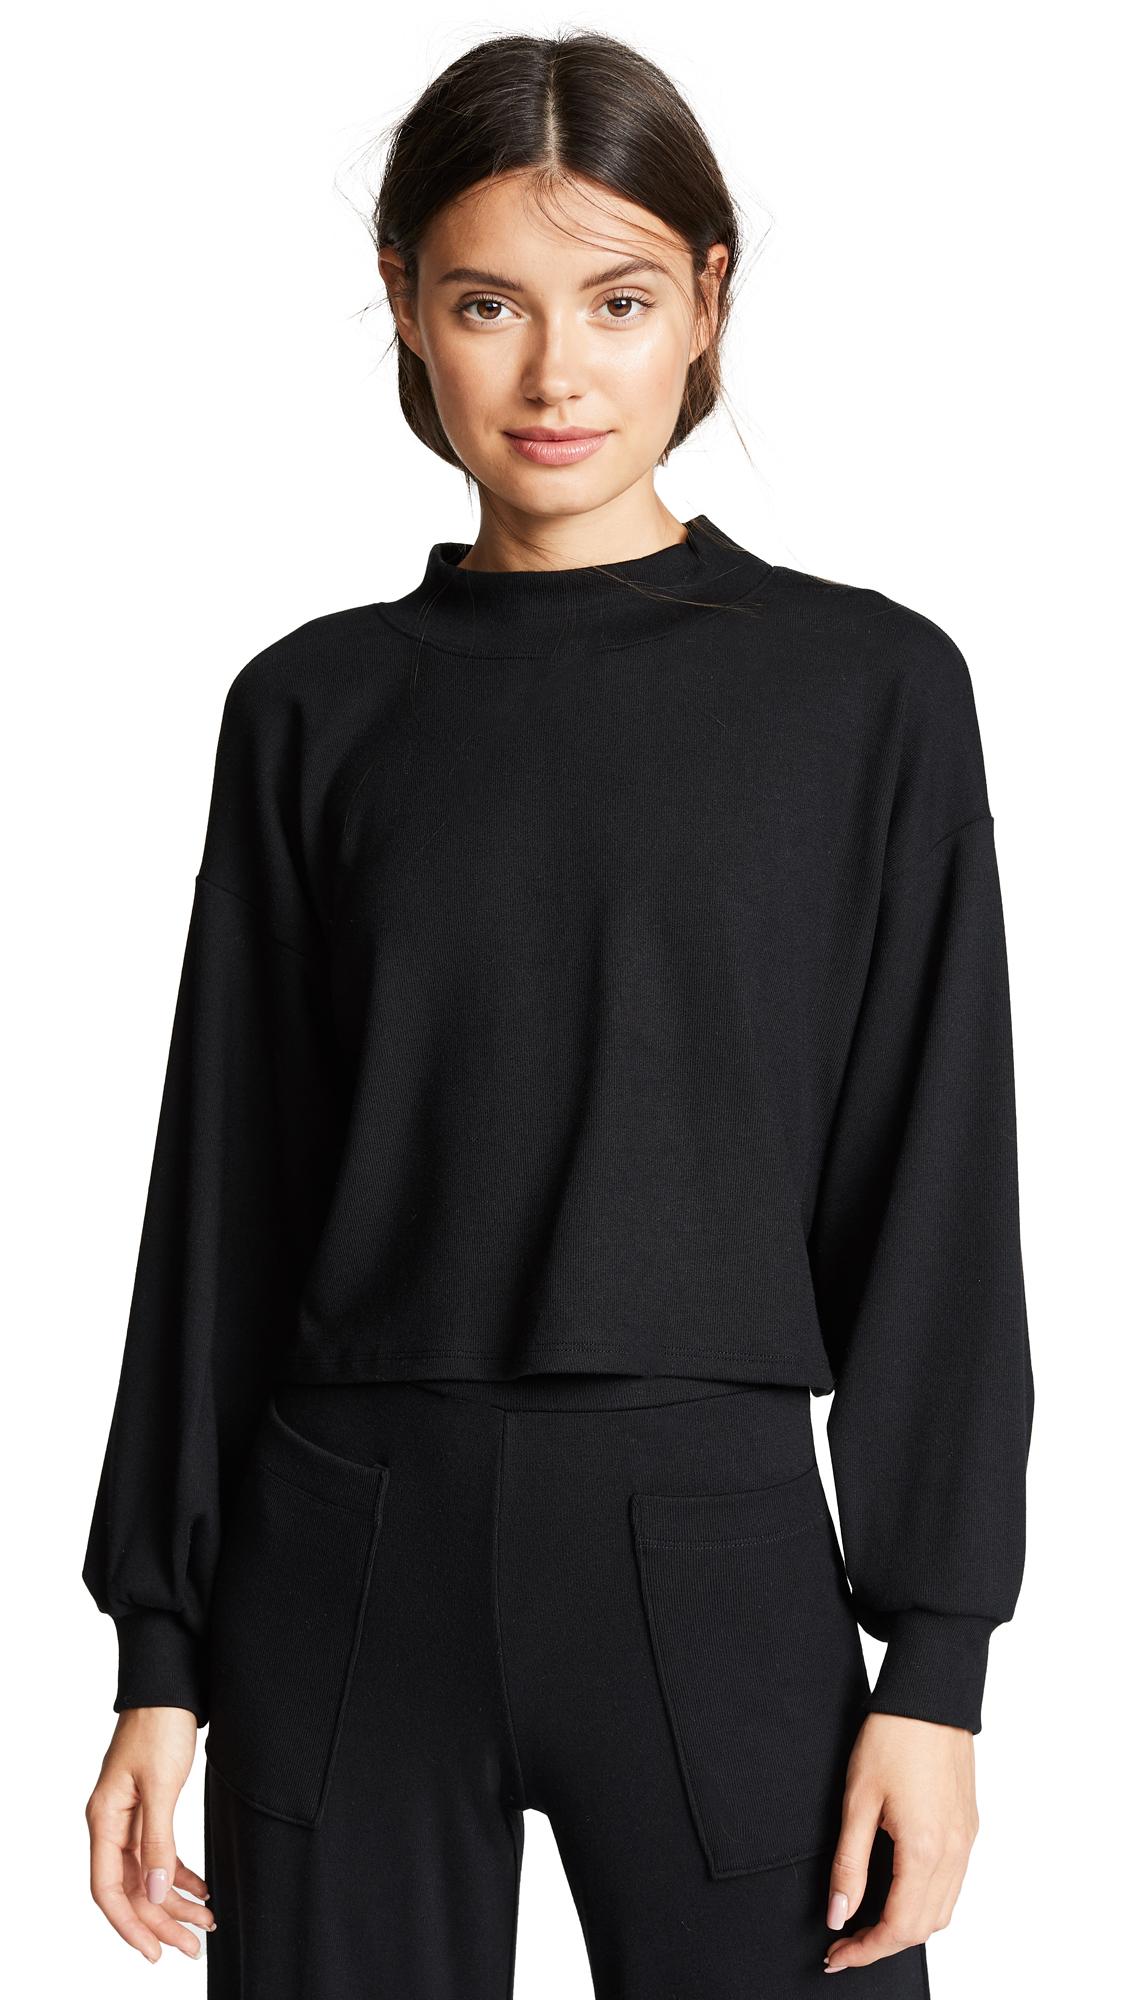 Rachel Pally Luxe Rib Sweatshirt In Black